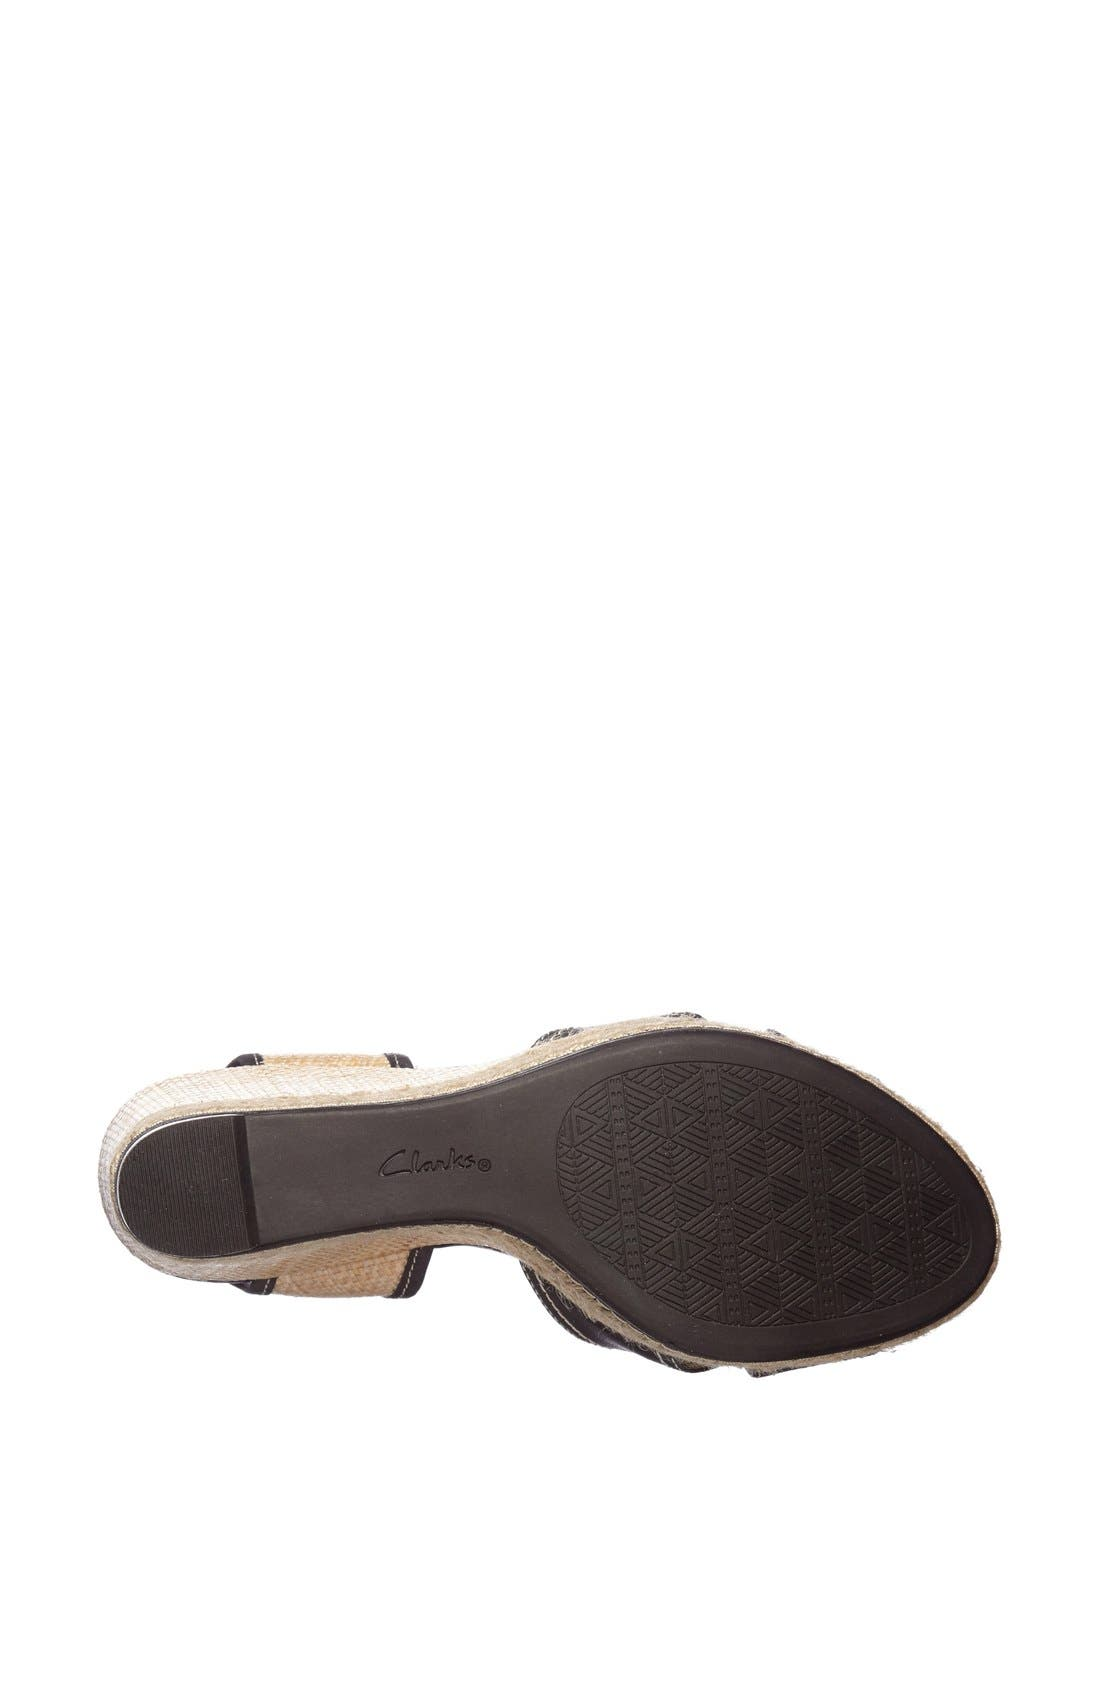 Alternate Image 3  - Clarks® 'Amelia Air' Espadrille Wedge Sandal